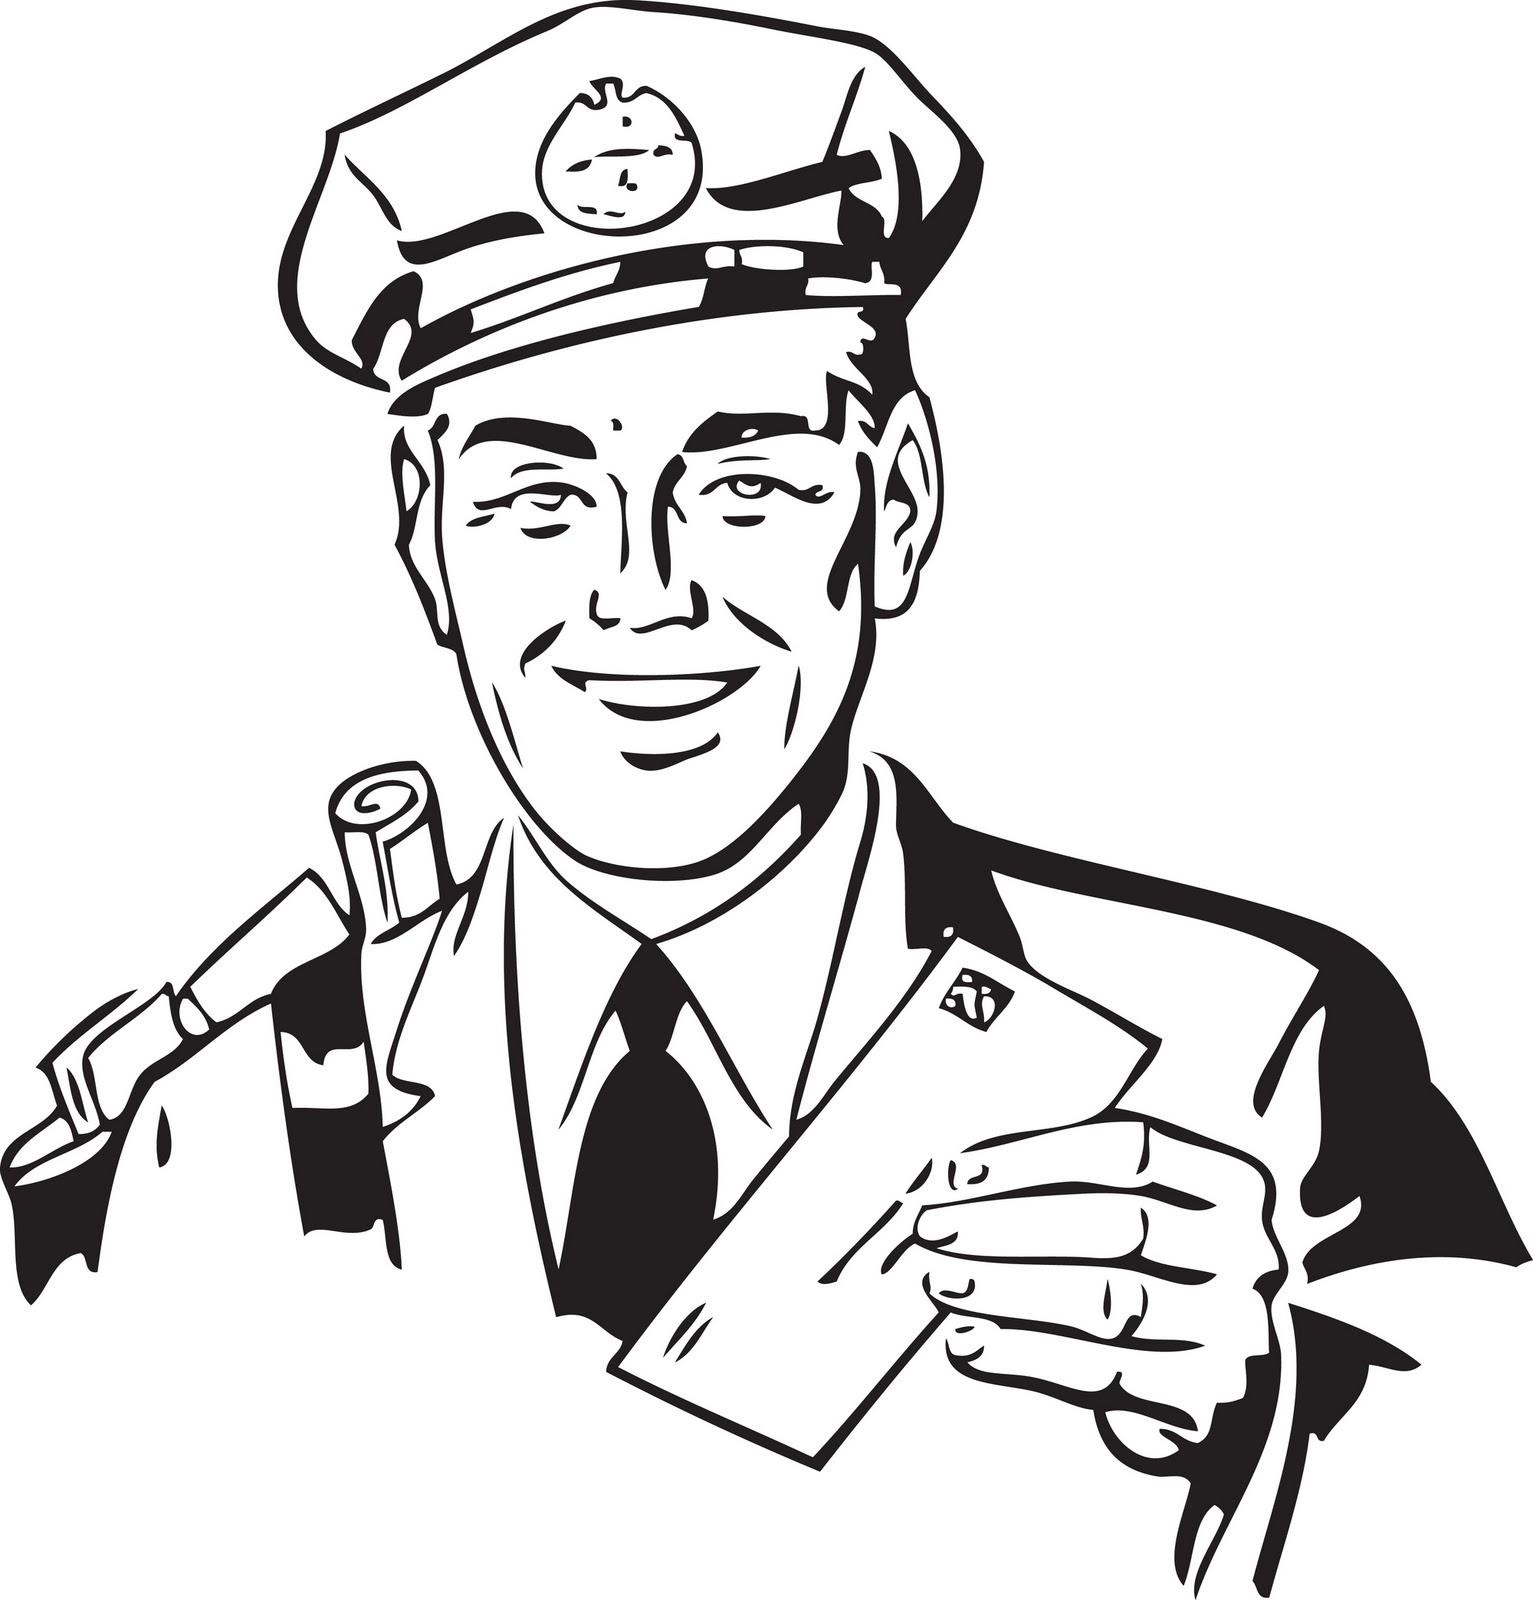 Mr postman. | Mister Postman - De Facteur | Pinterest